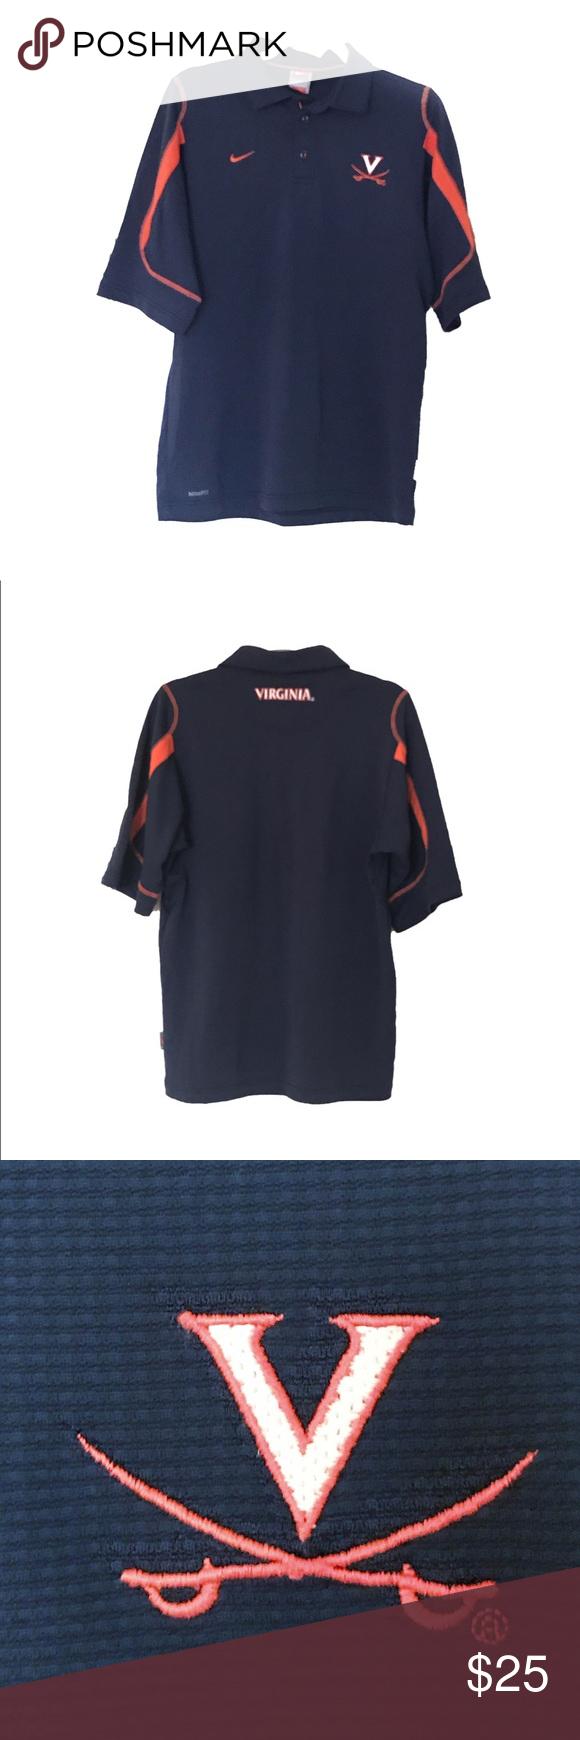 Nike Virginia Golf Shirt UVA Small 100 Polyester